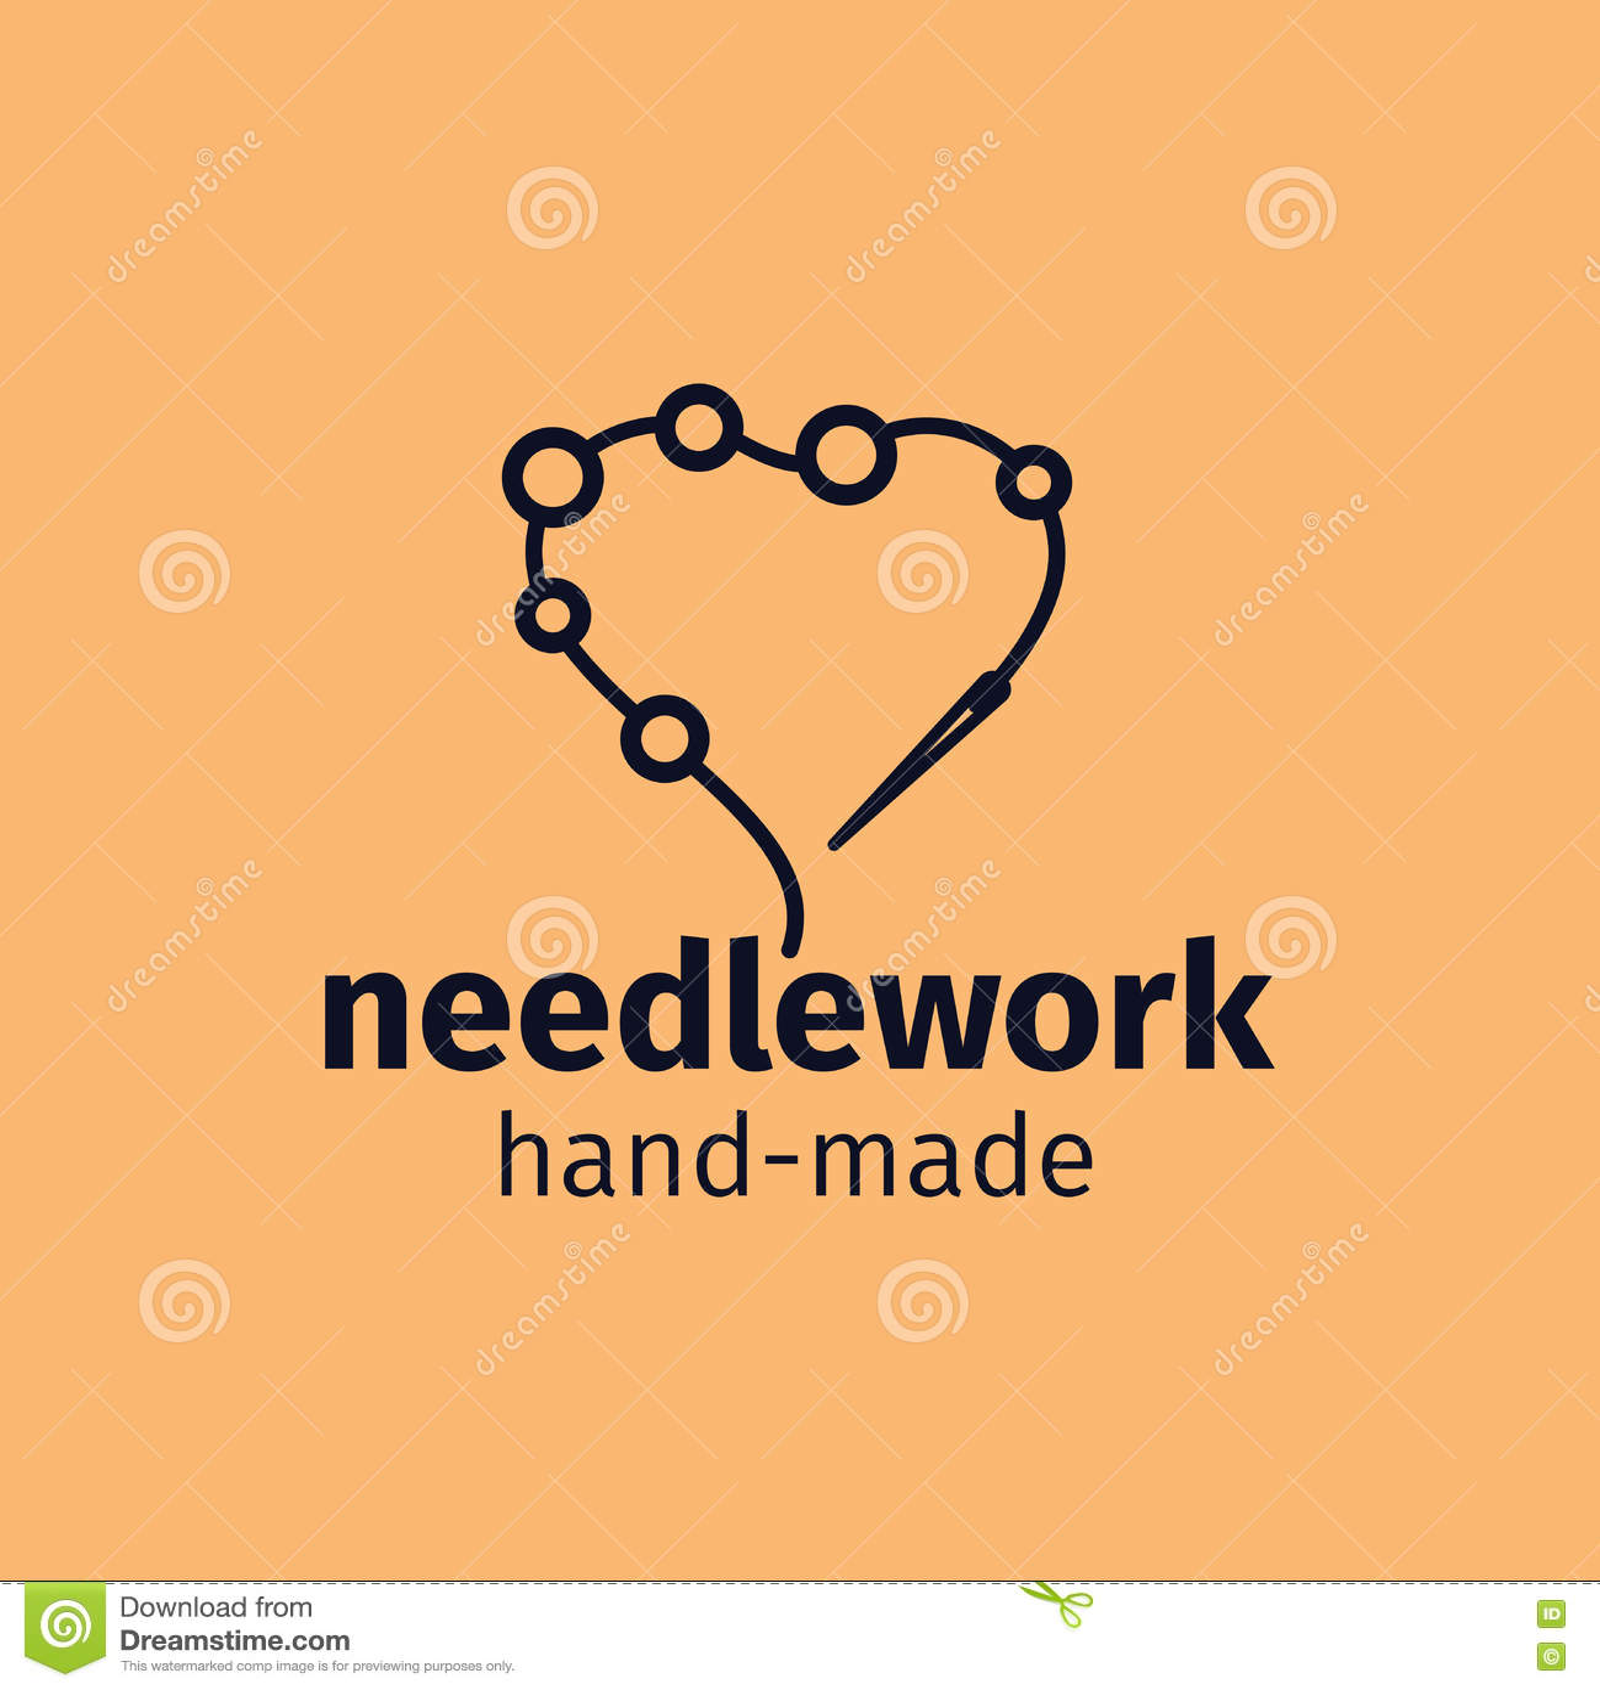 Needlework Handmade Logo Design Stock Vector - Image: 78317582